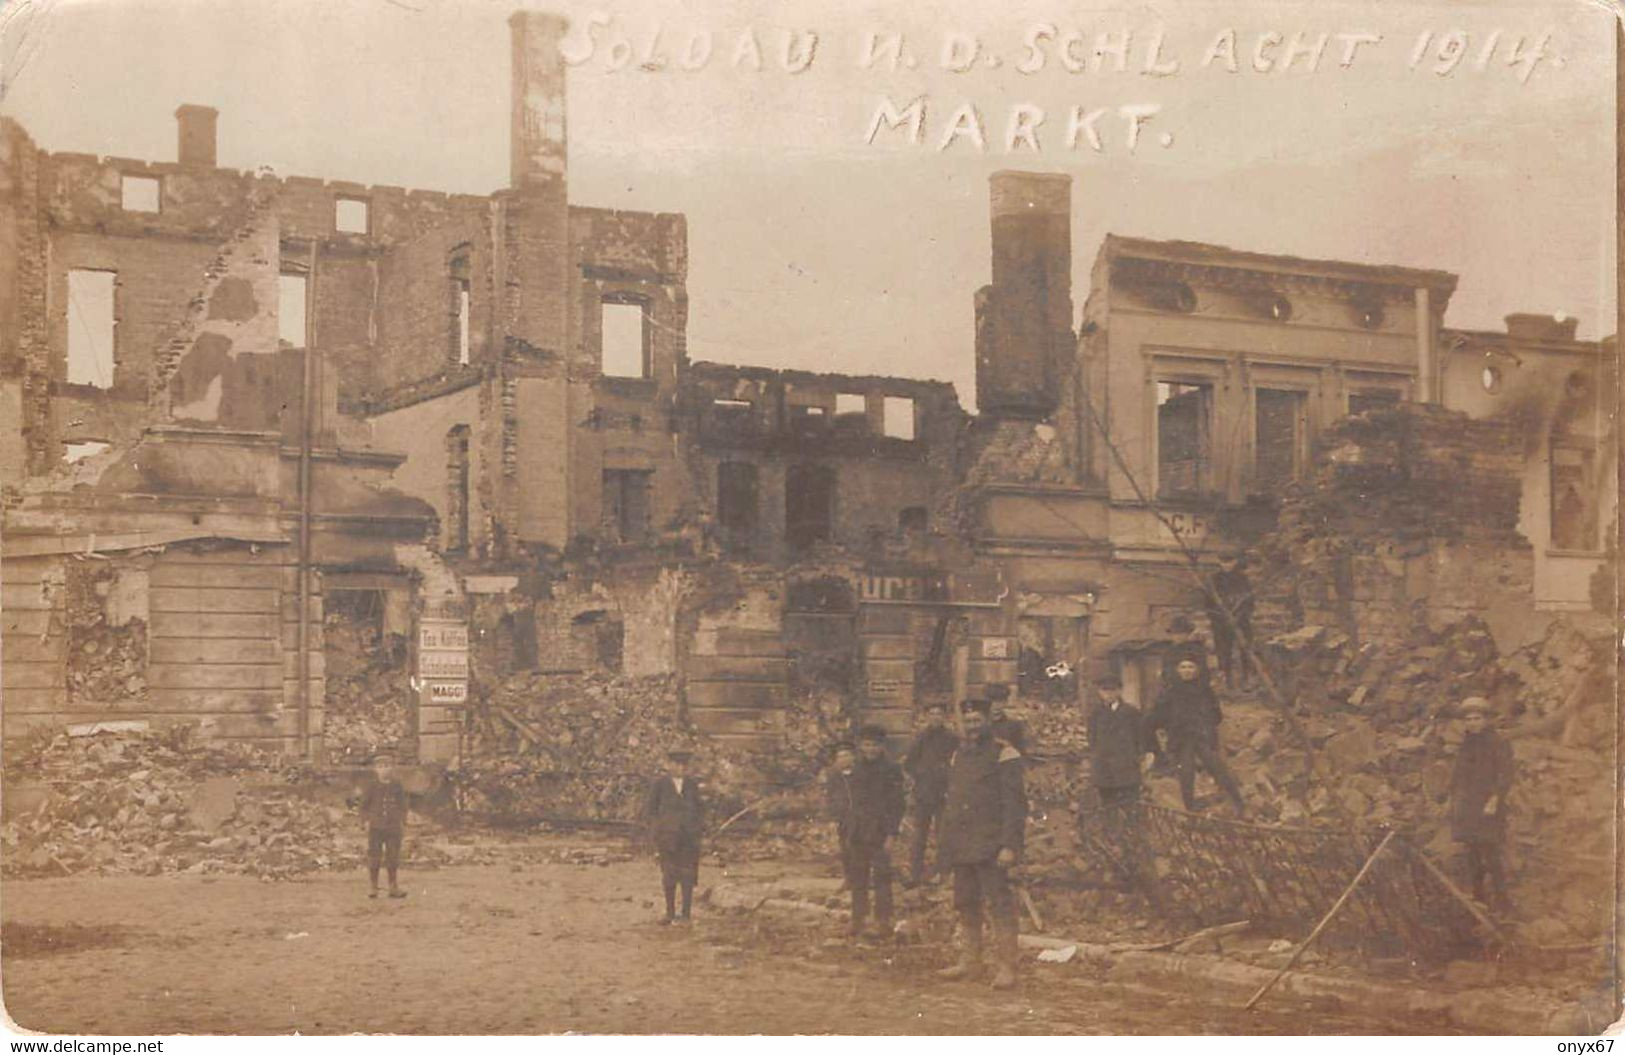 Carte Postale Photo SOLDAU-DZIALDOWO-Pologne-Polen-Poland-Polska-Markt-Schlacht 1914-Krieg - Polonia